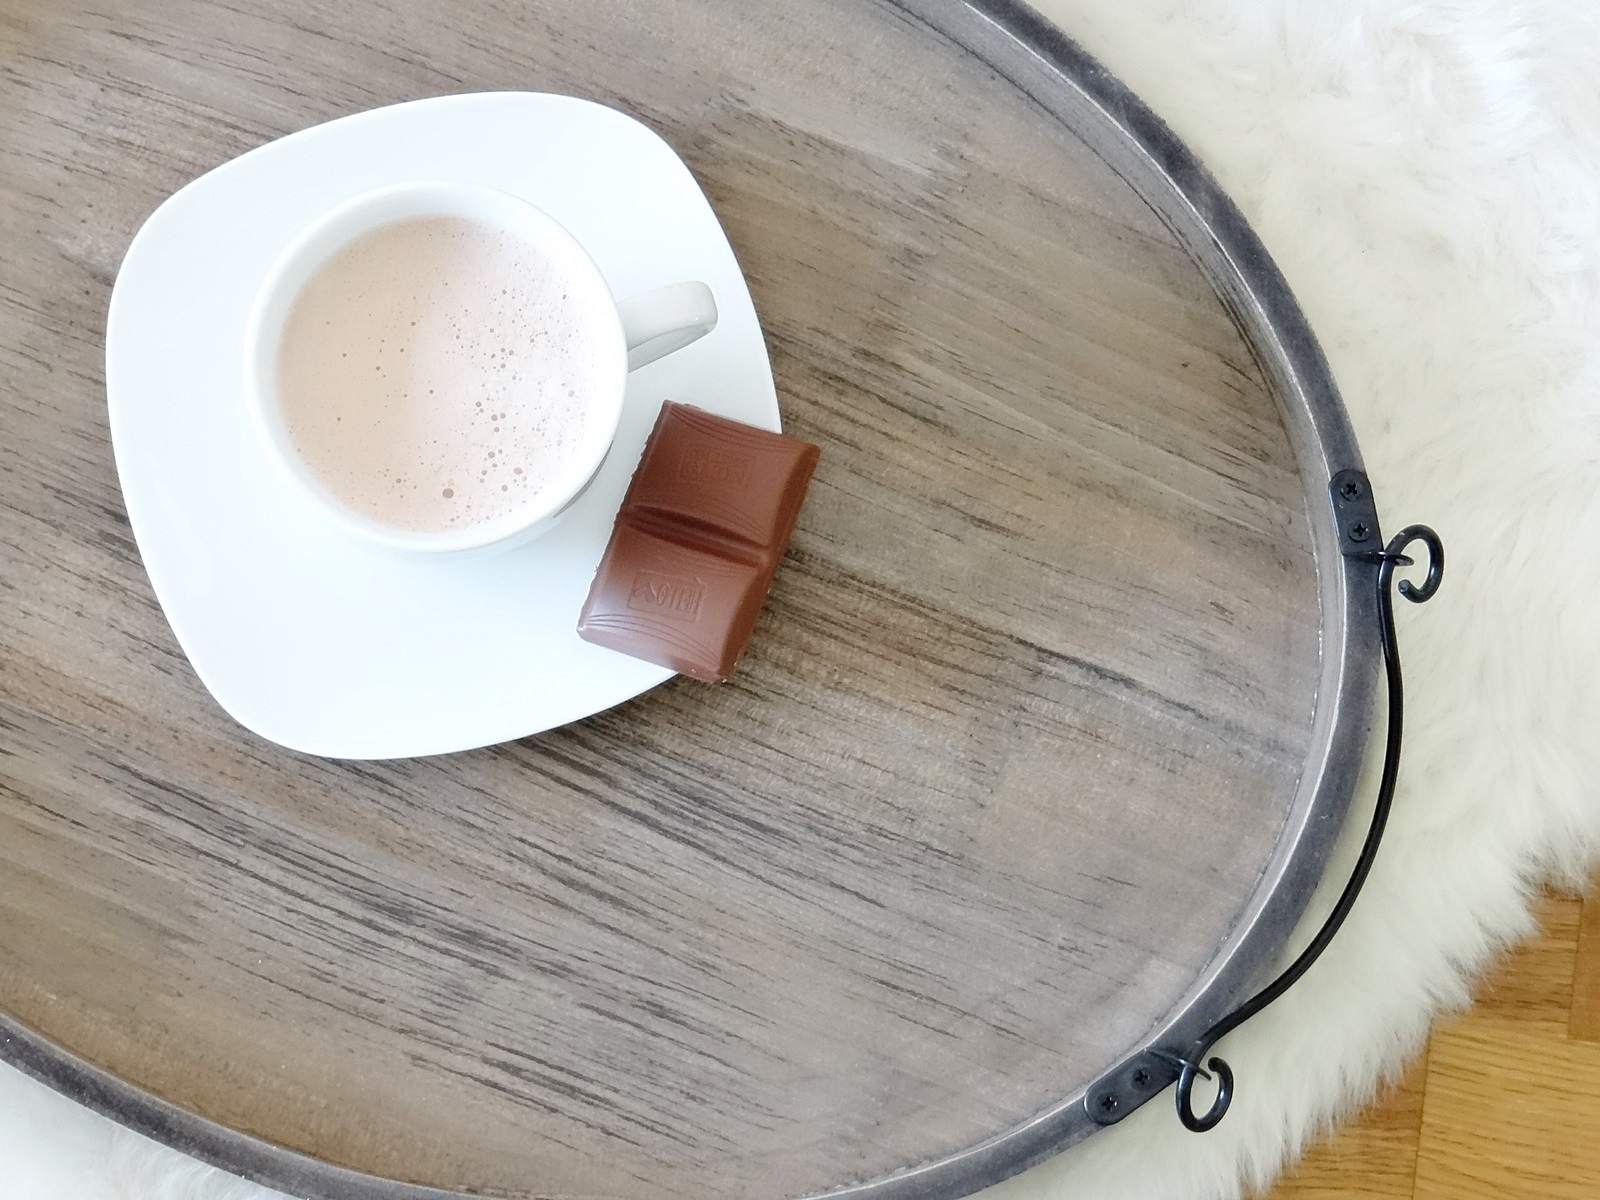 chocolate-kaffee-von-cafe-royal